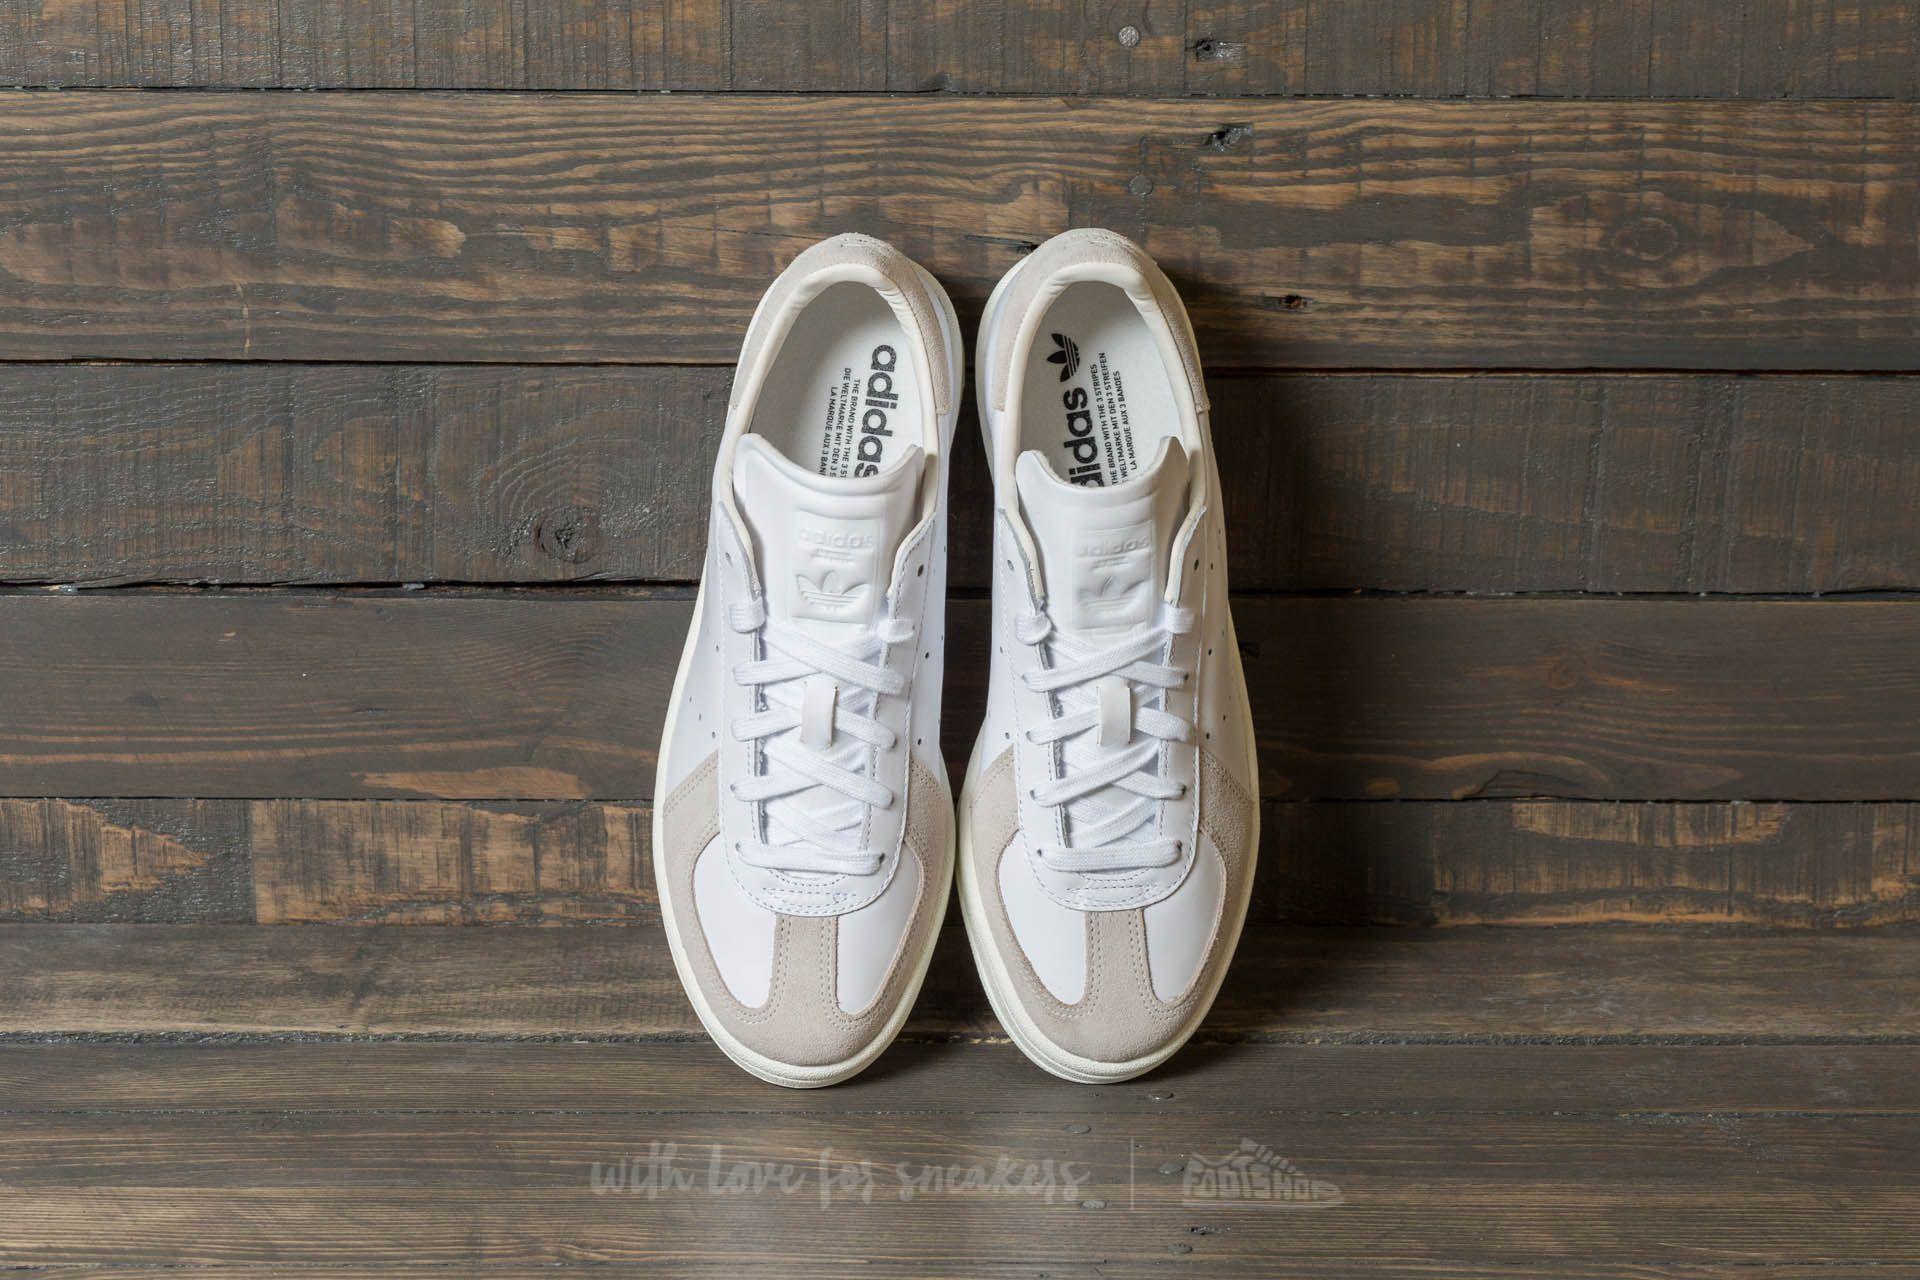 4d4c926f74bc adidas BW Avenue Footwear White  Footwear White  Chalk White la un preț  excelent 372